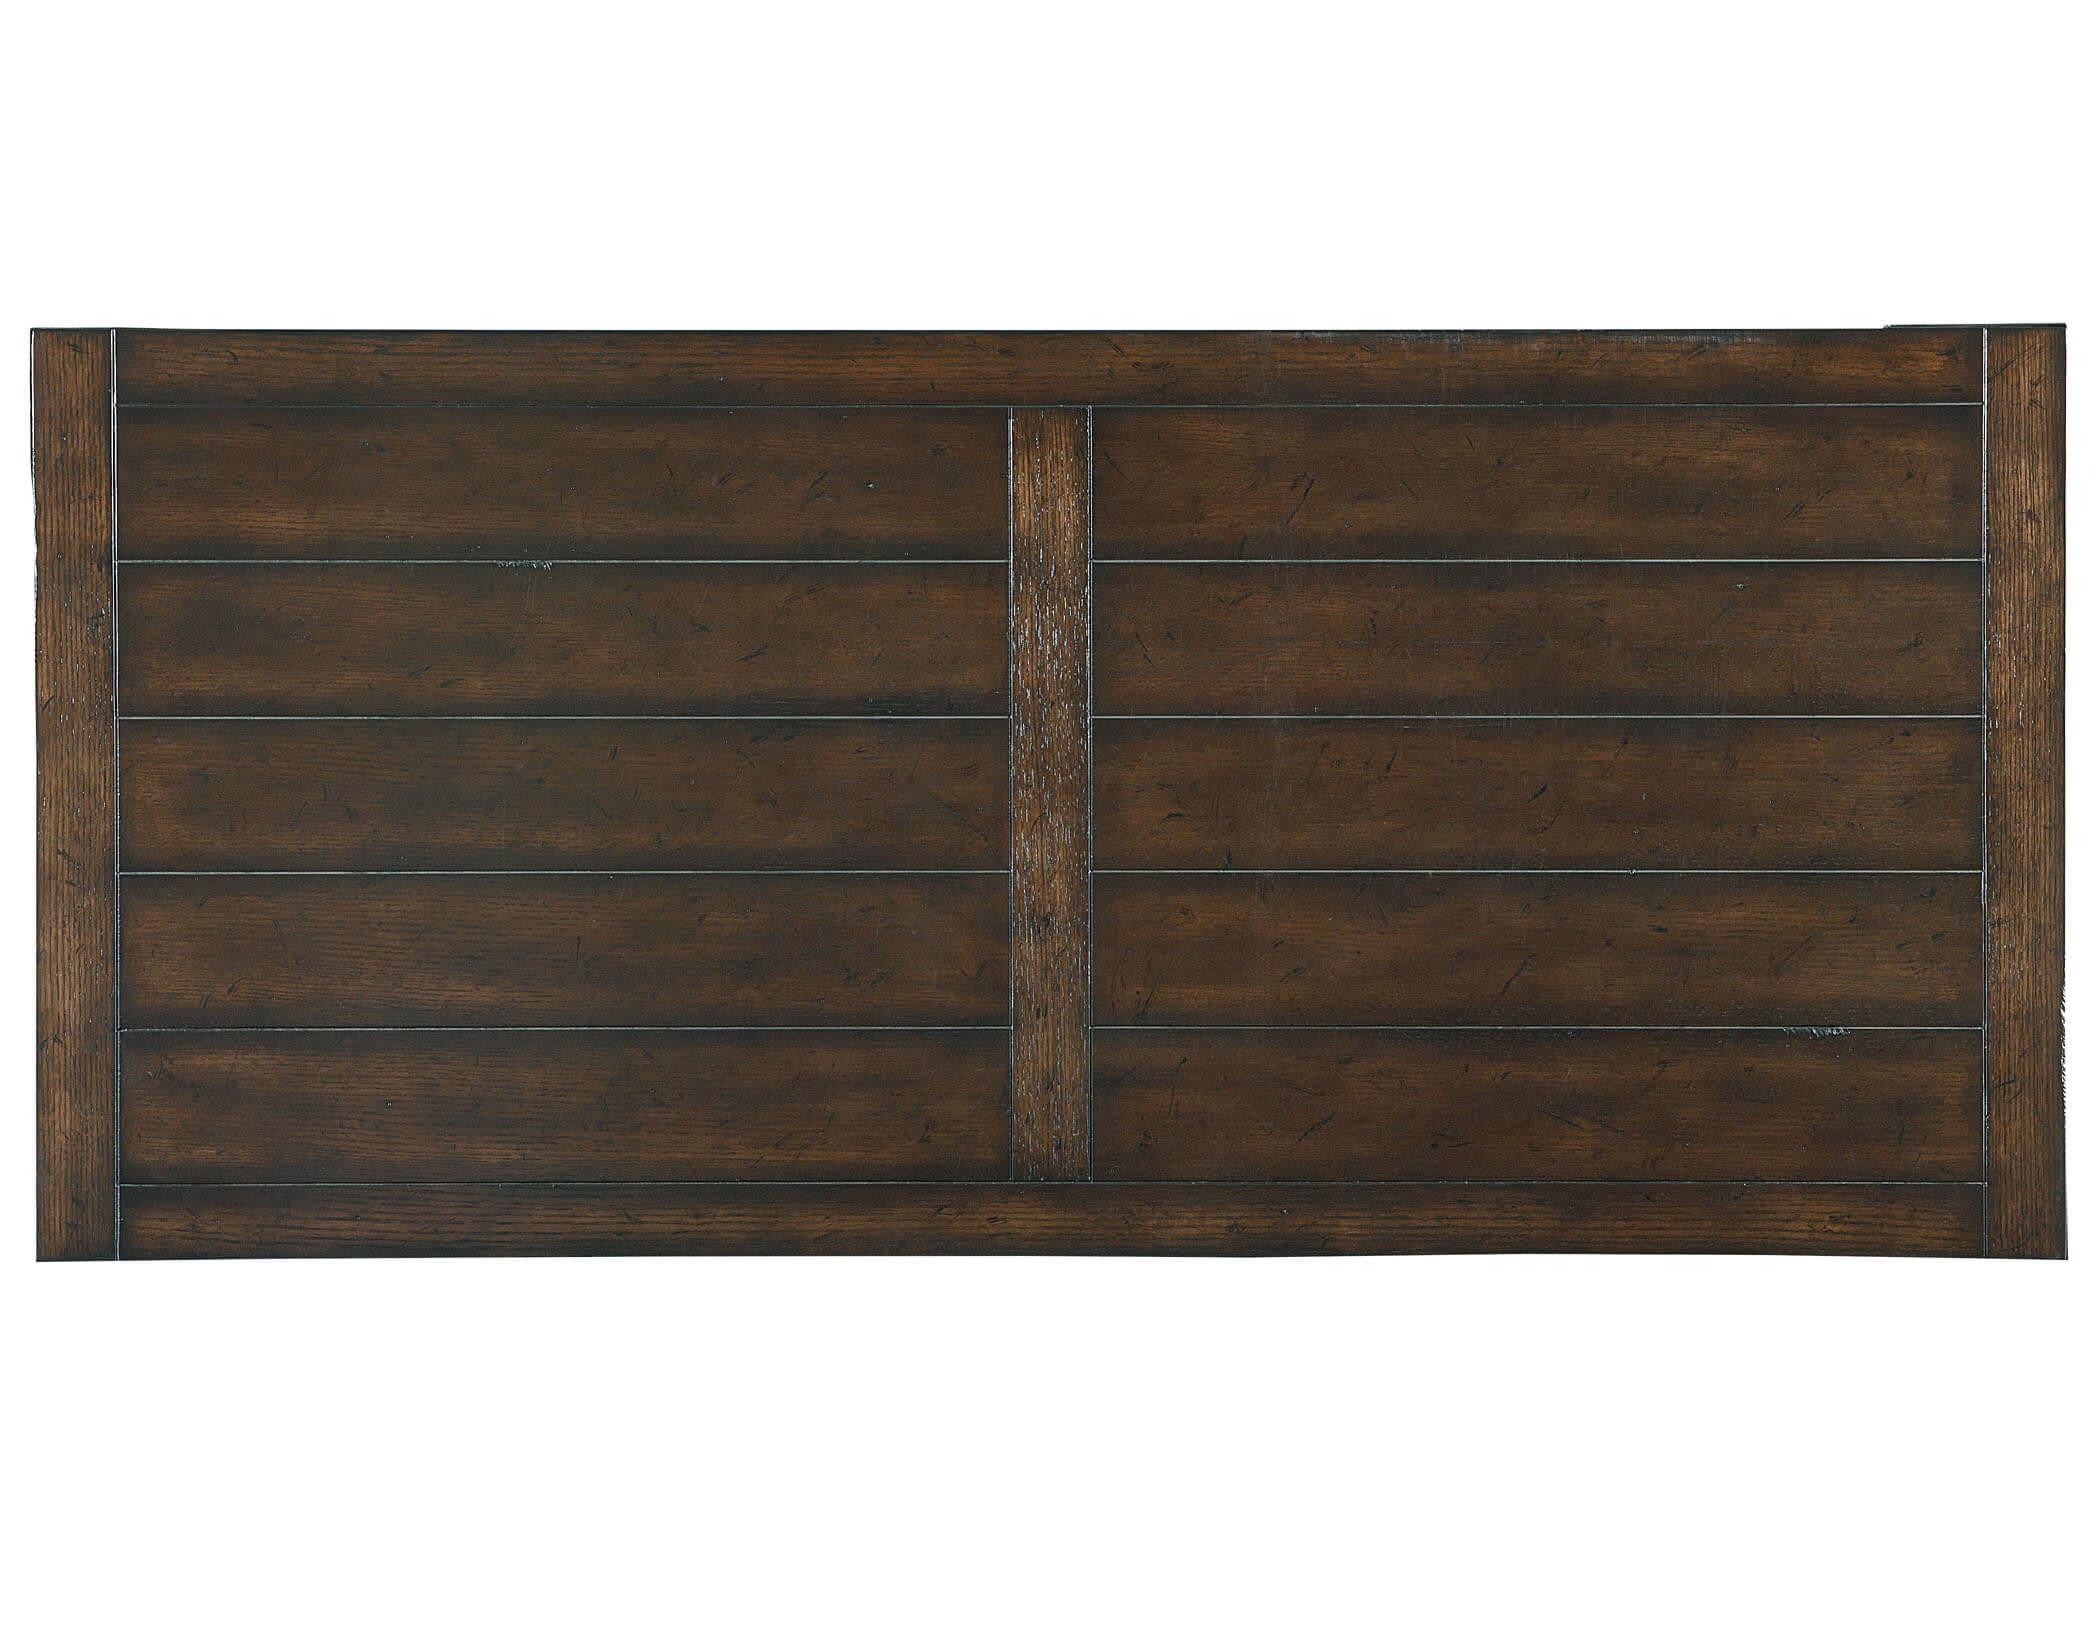 urban home sullivan sofa cheap beds chicago dark oak coffee end tables living room sets